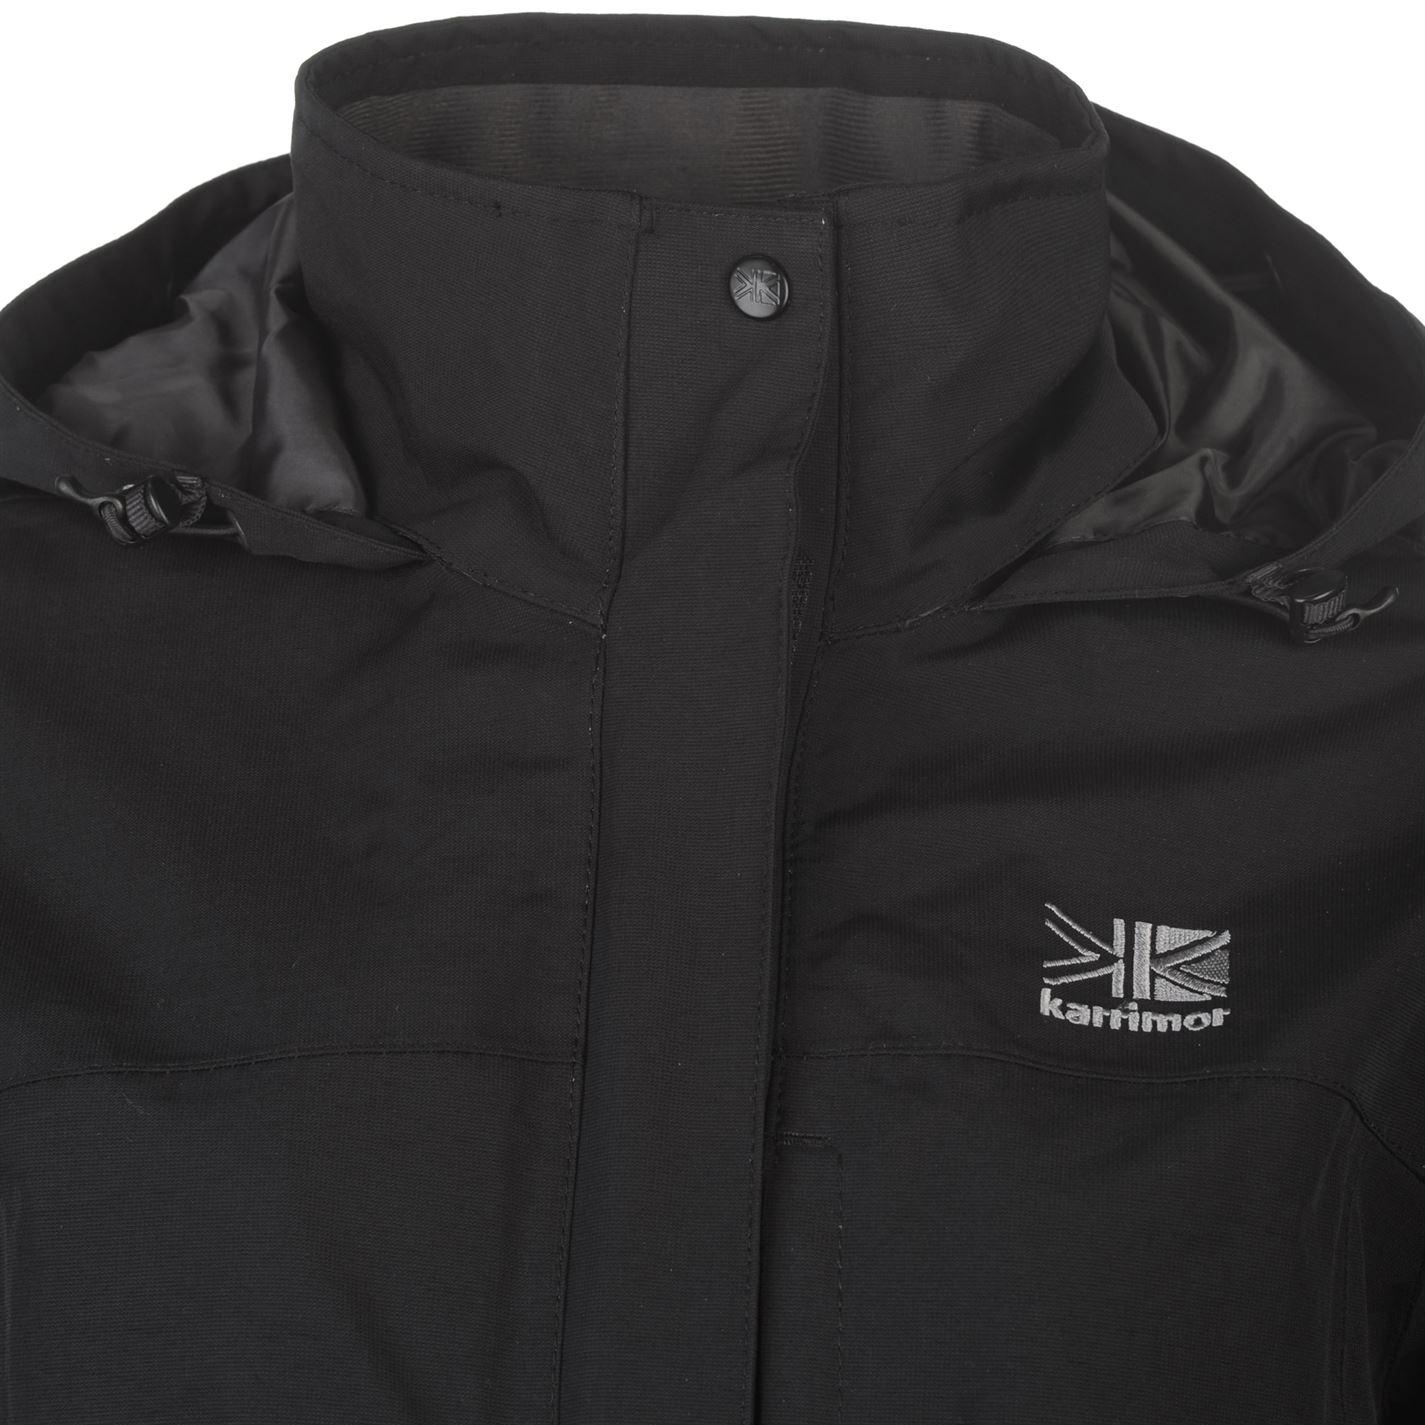 Karrimor Urban Jacket Ladies